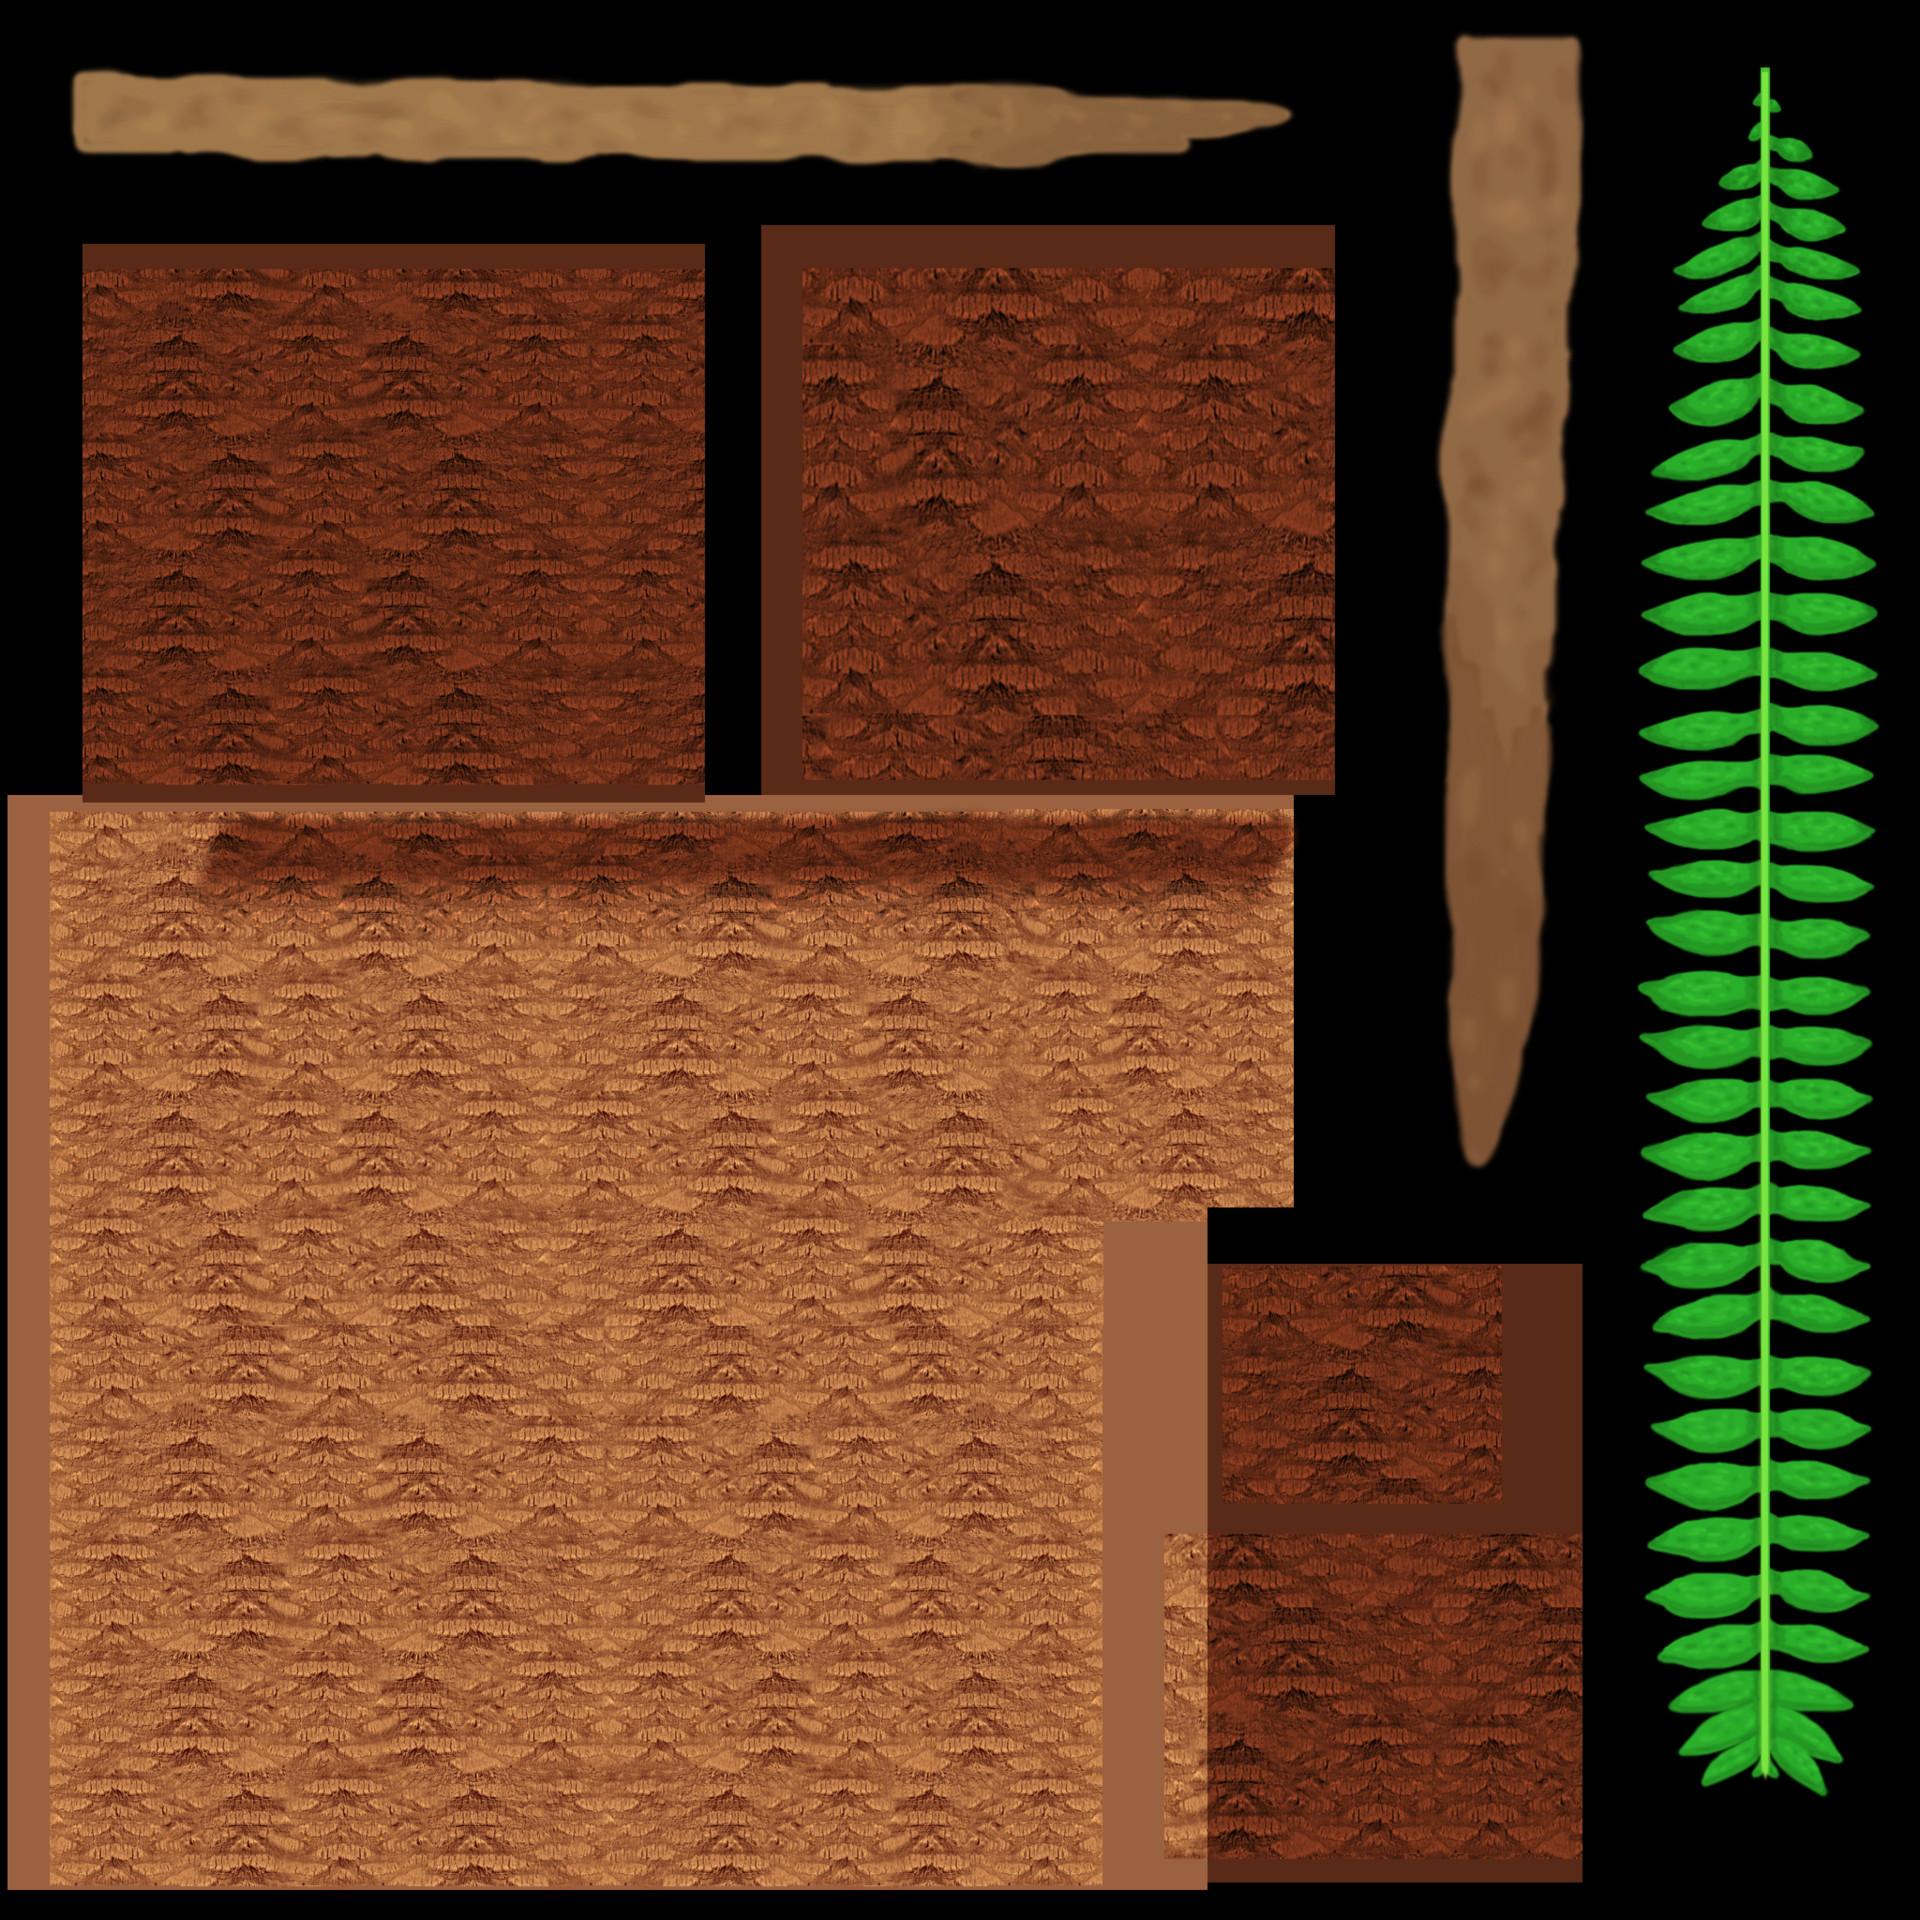 James skinner palmtree texture2